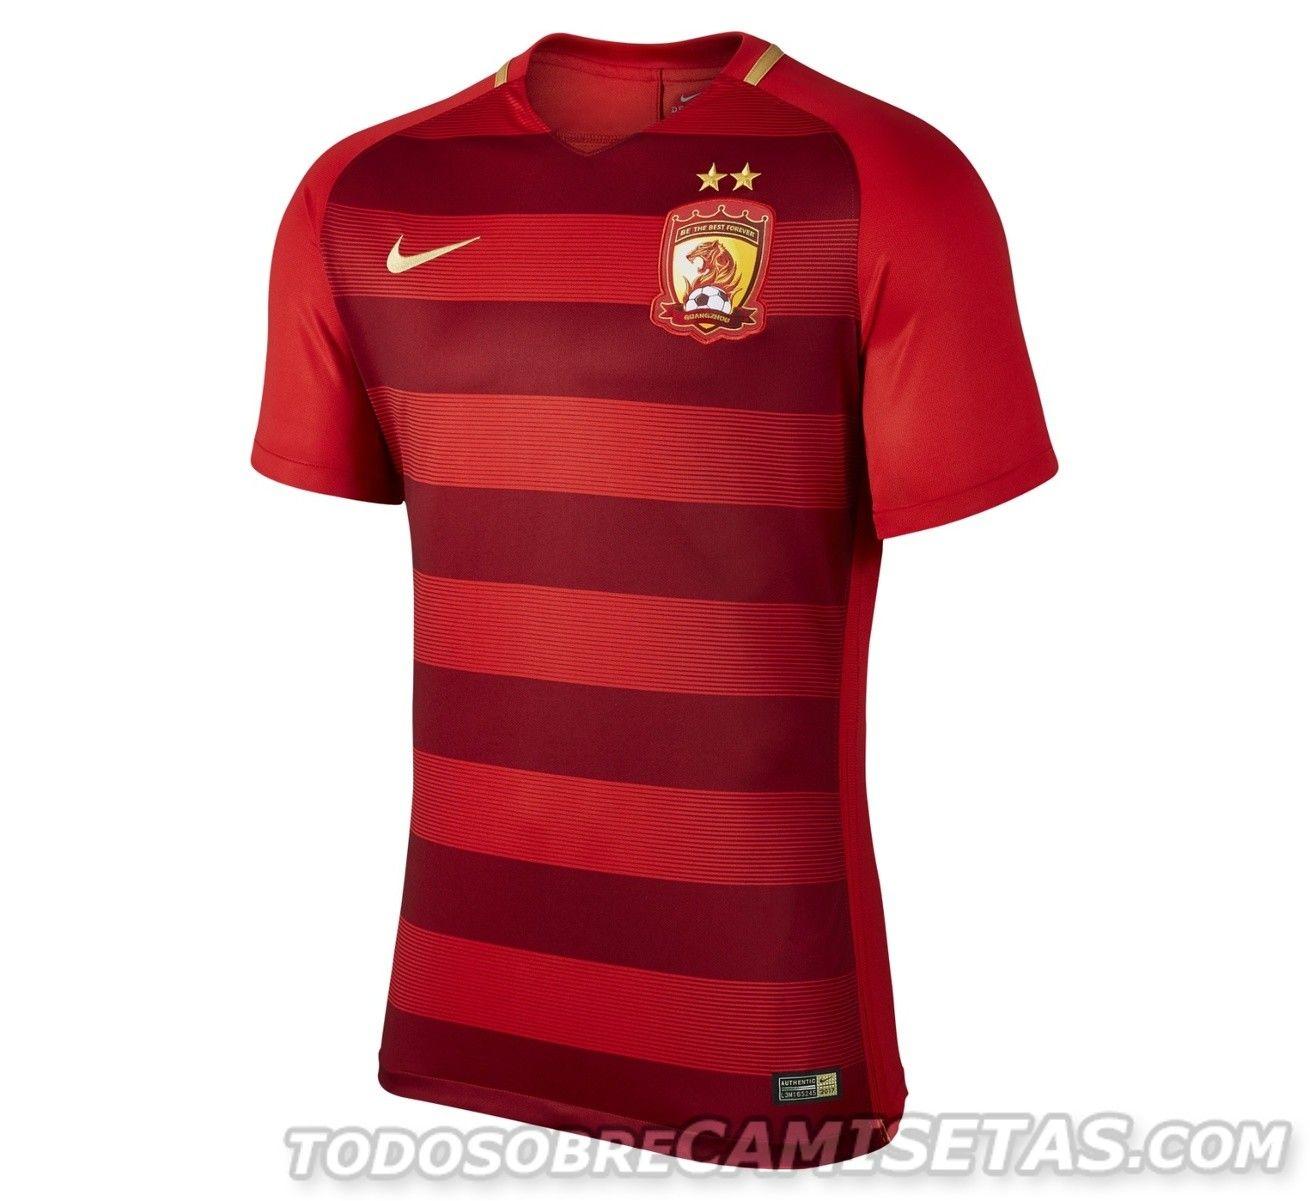 Guangzhou Evergrande Nike 2017 Home Kit Soccer shirts, Mens